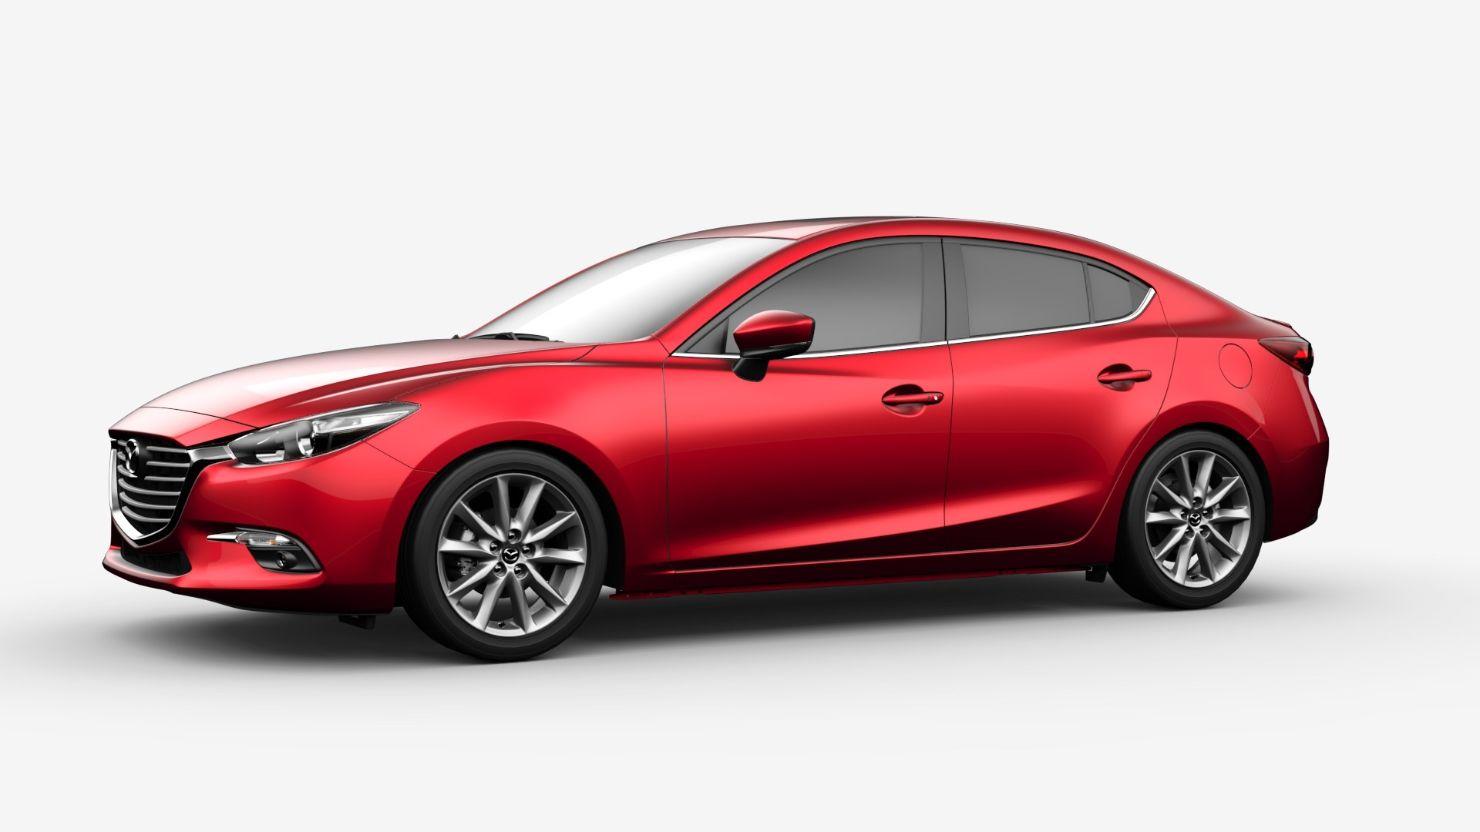 2017 Mazda 3 Sedan Fuel Efficient Compact Car Mazda Usa Mazda 3 Hatchback Mazda 3 Sedan Mazda